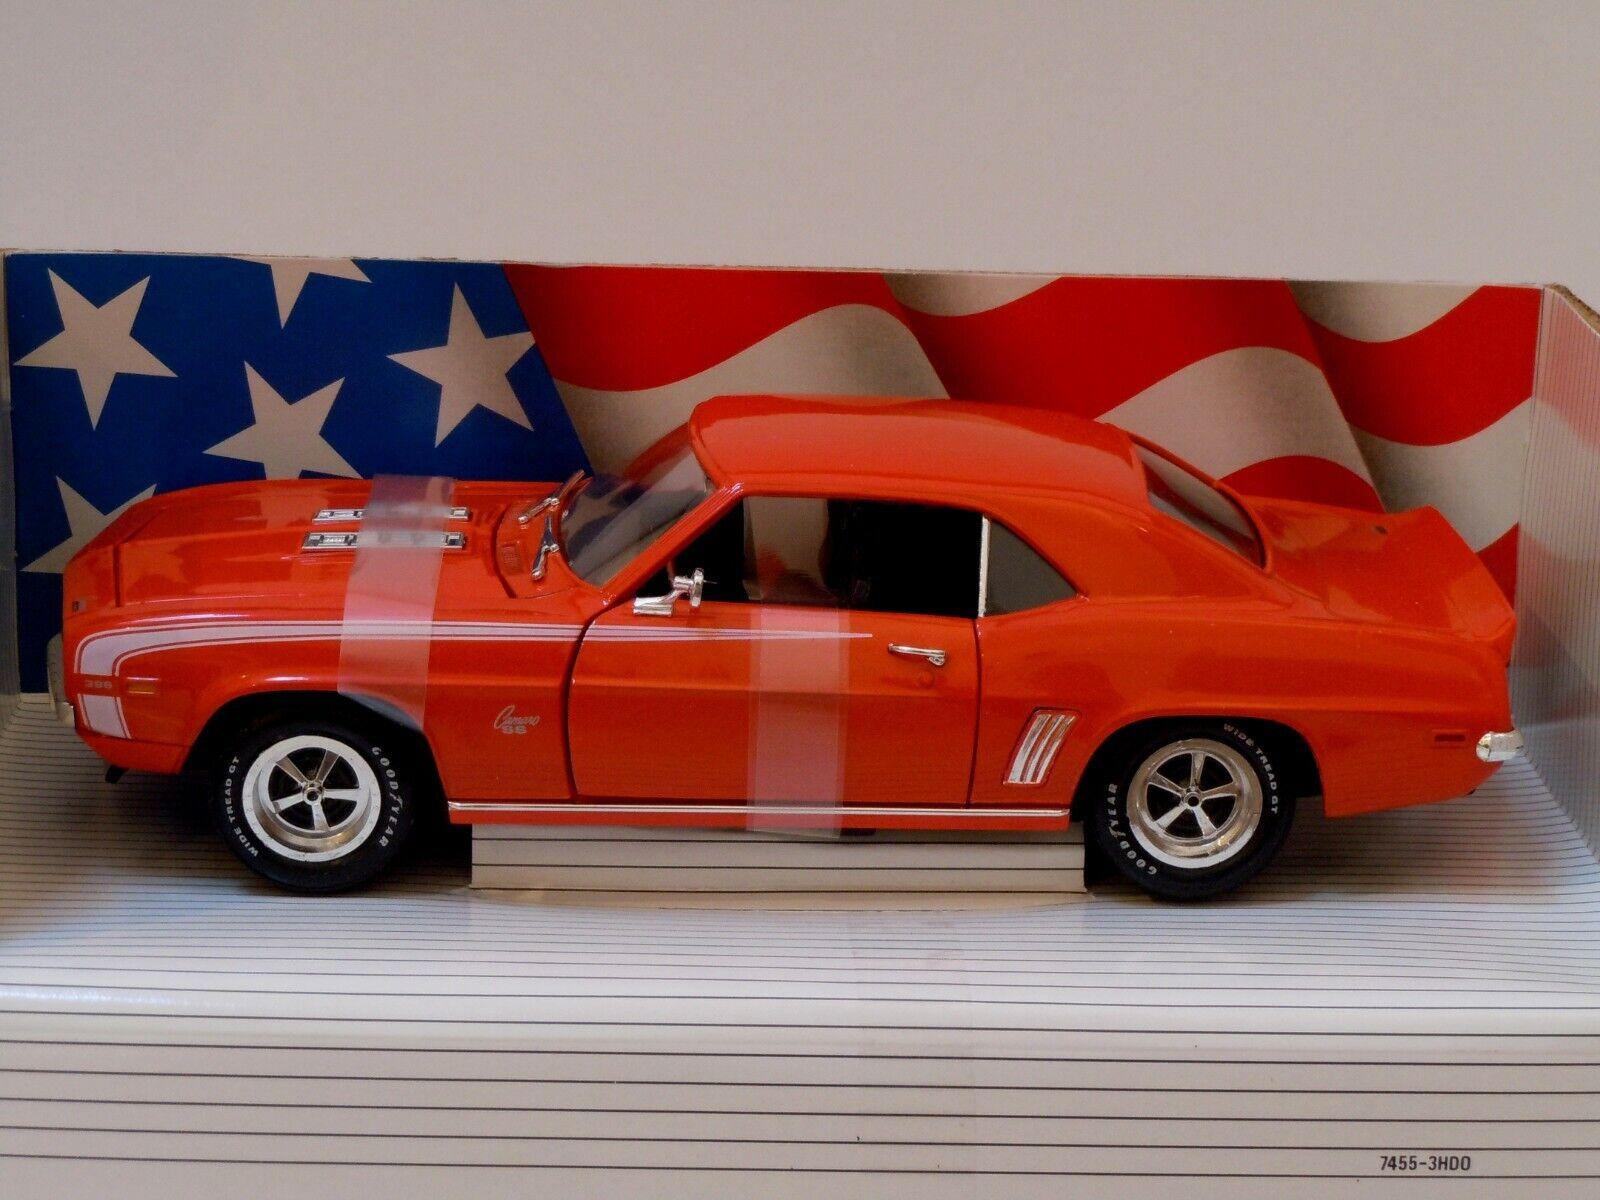 1969 Chevrolet Chevy Camaro Ss 396 Naranja Ertl Diecast Escala 1 18 Nuevo